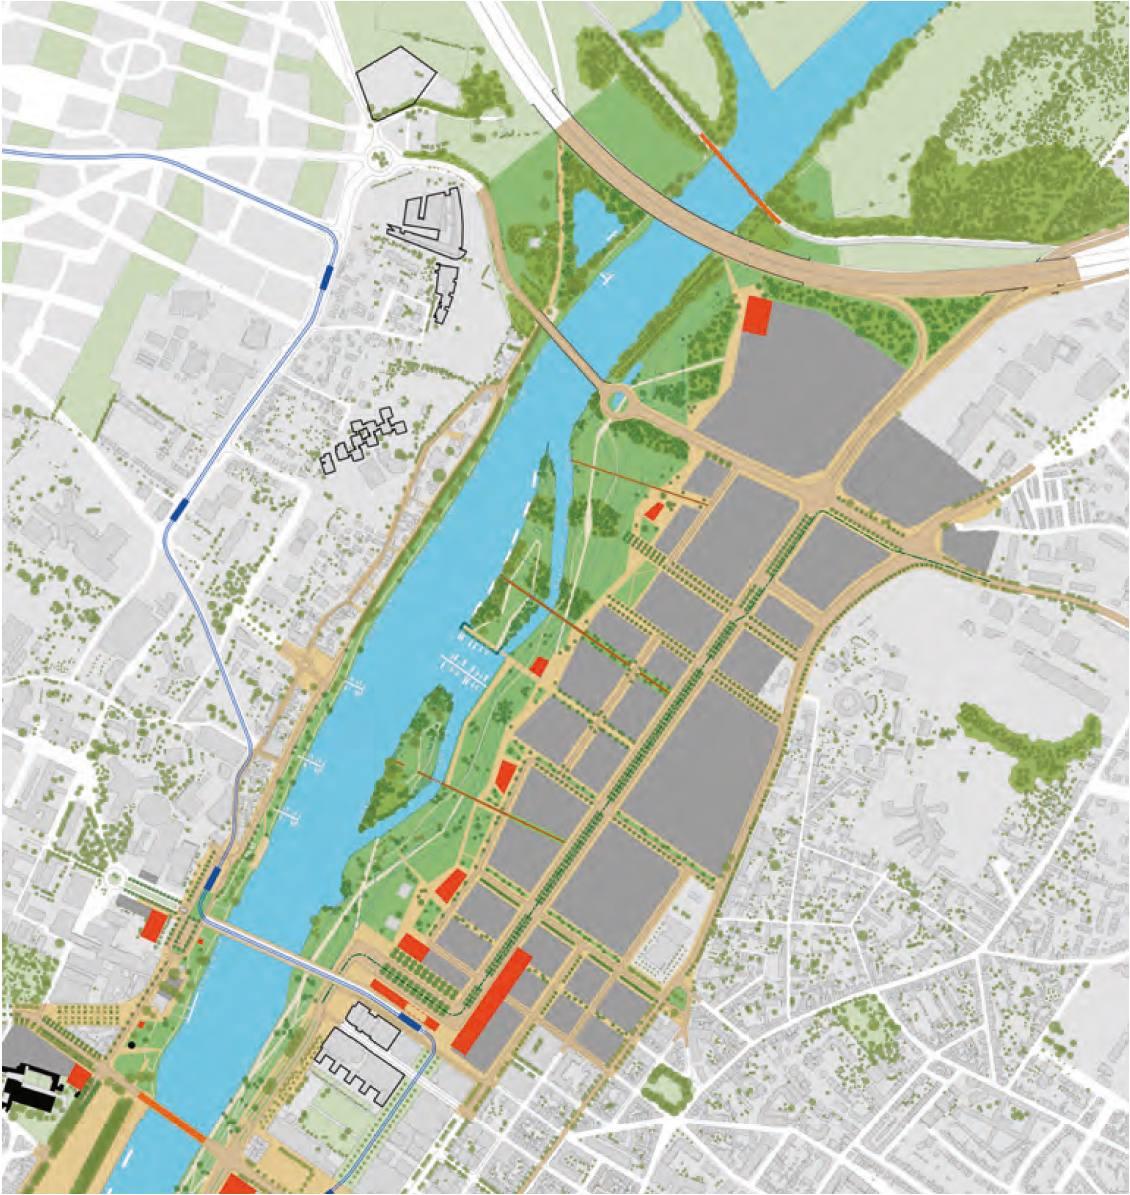 Angers Rives du Maine secteur Saint Serge plan guide Grether